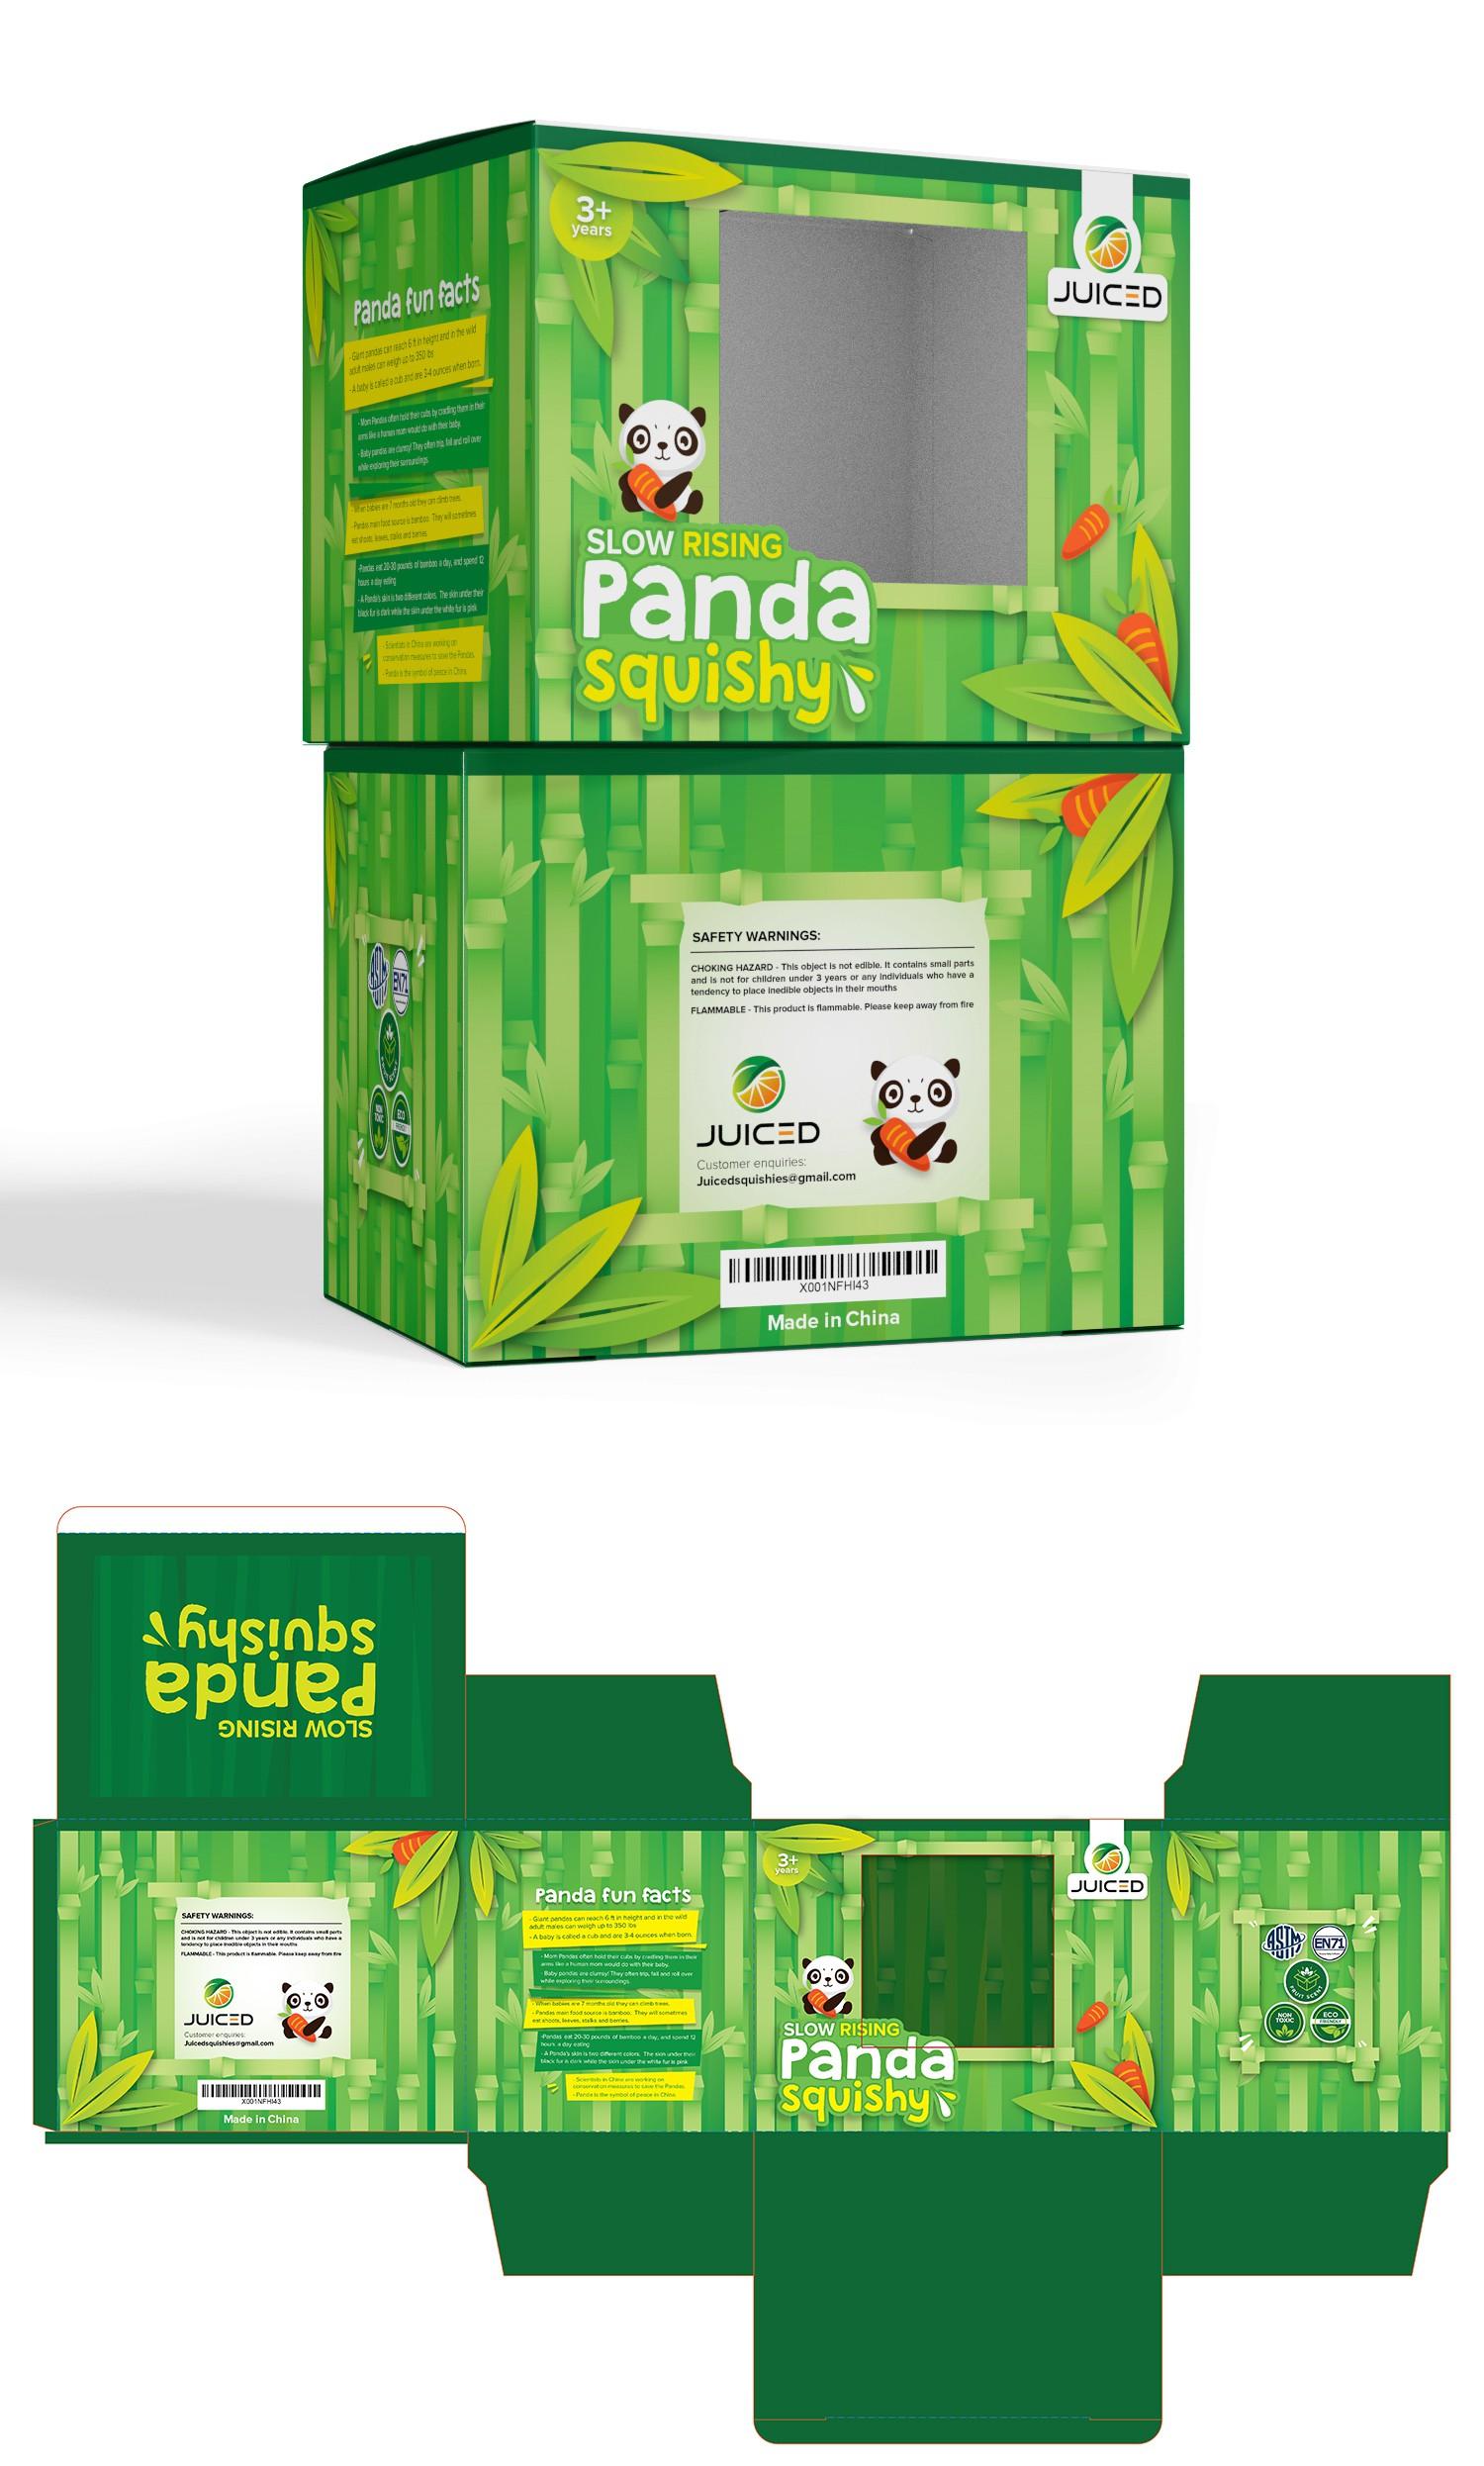 Slow rising Panda squishy toy packaging with bamboo jungle habitat theme